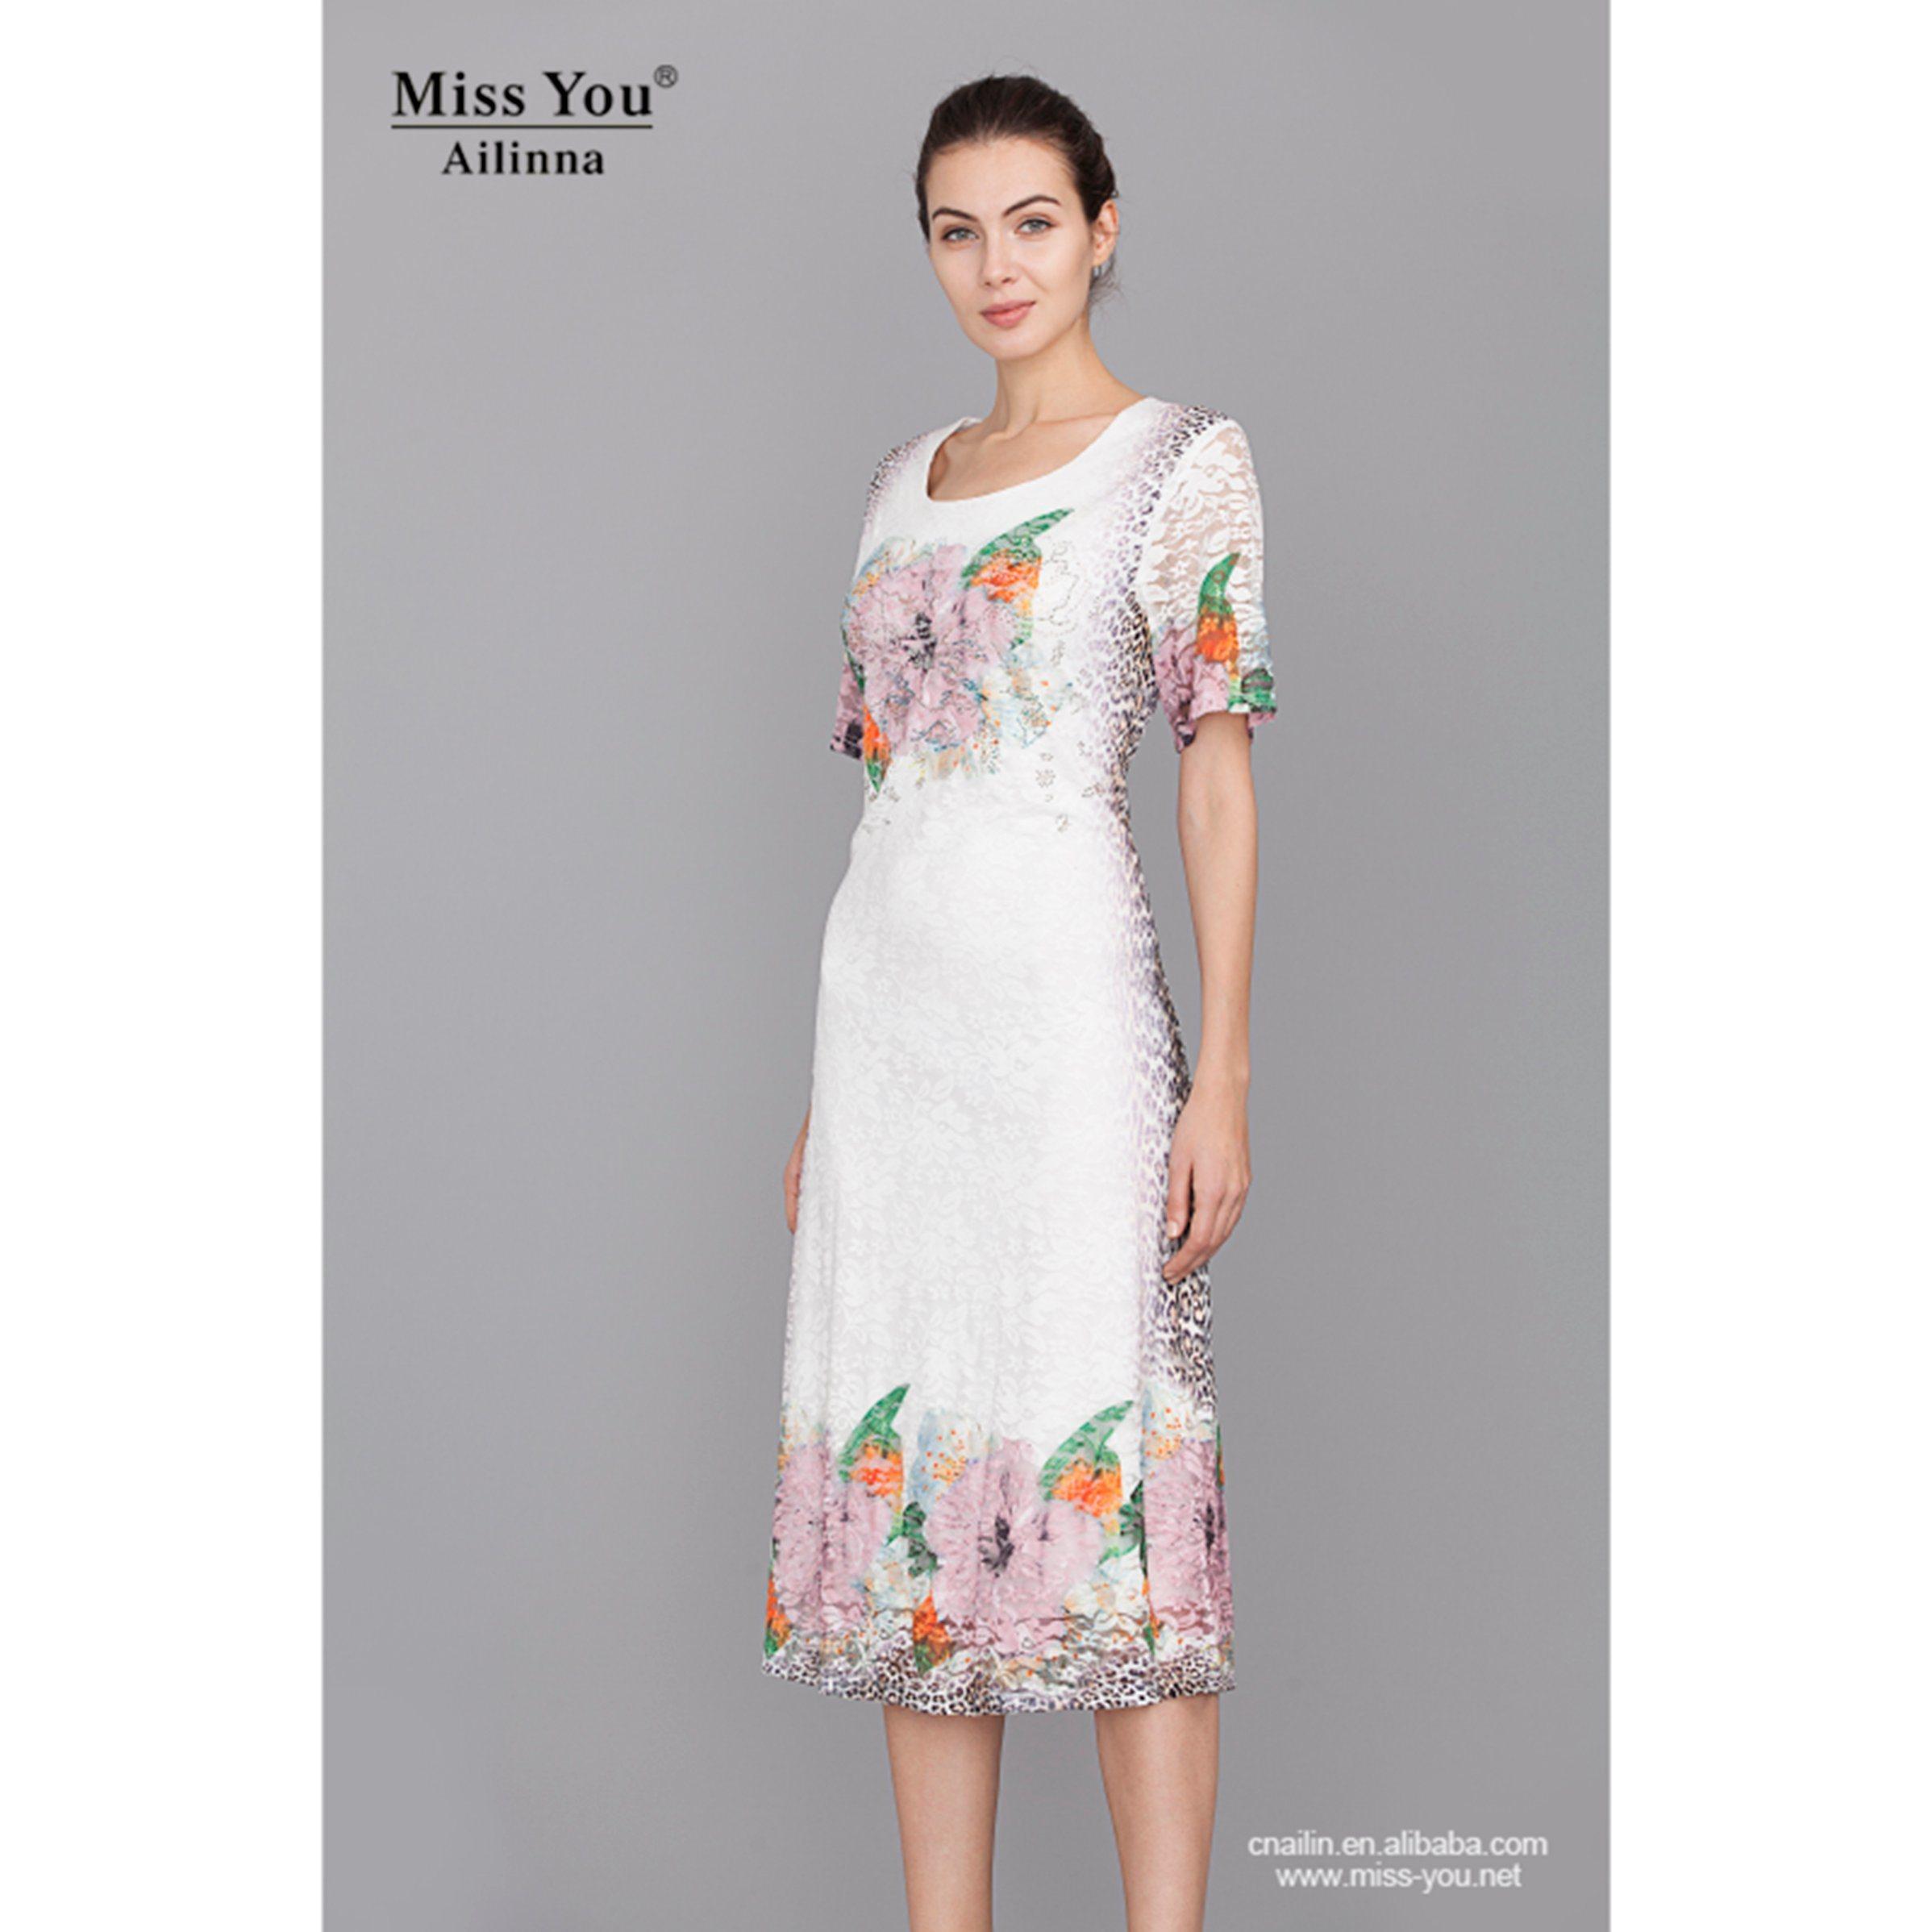 Miss You Ailinna 801856 Women Elegant White Lace Print Dress